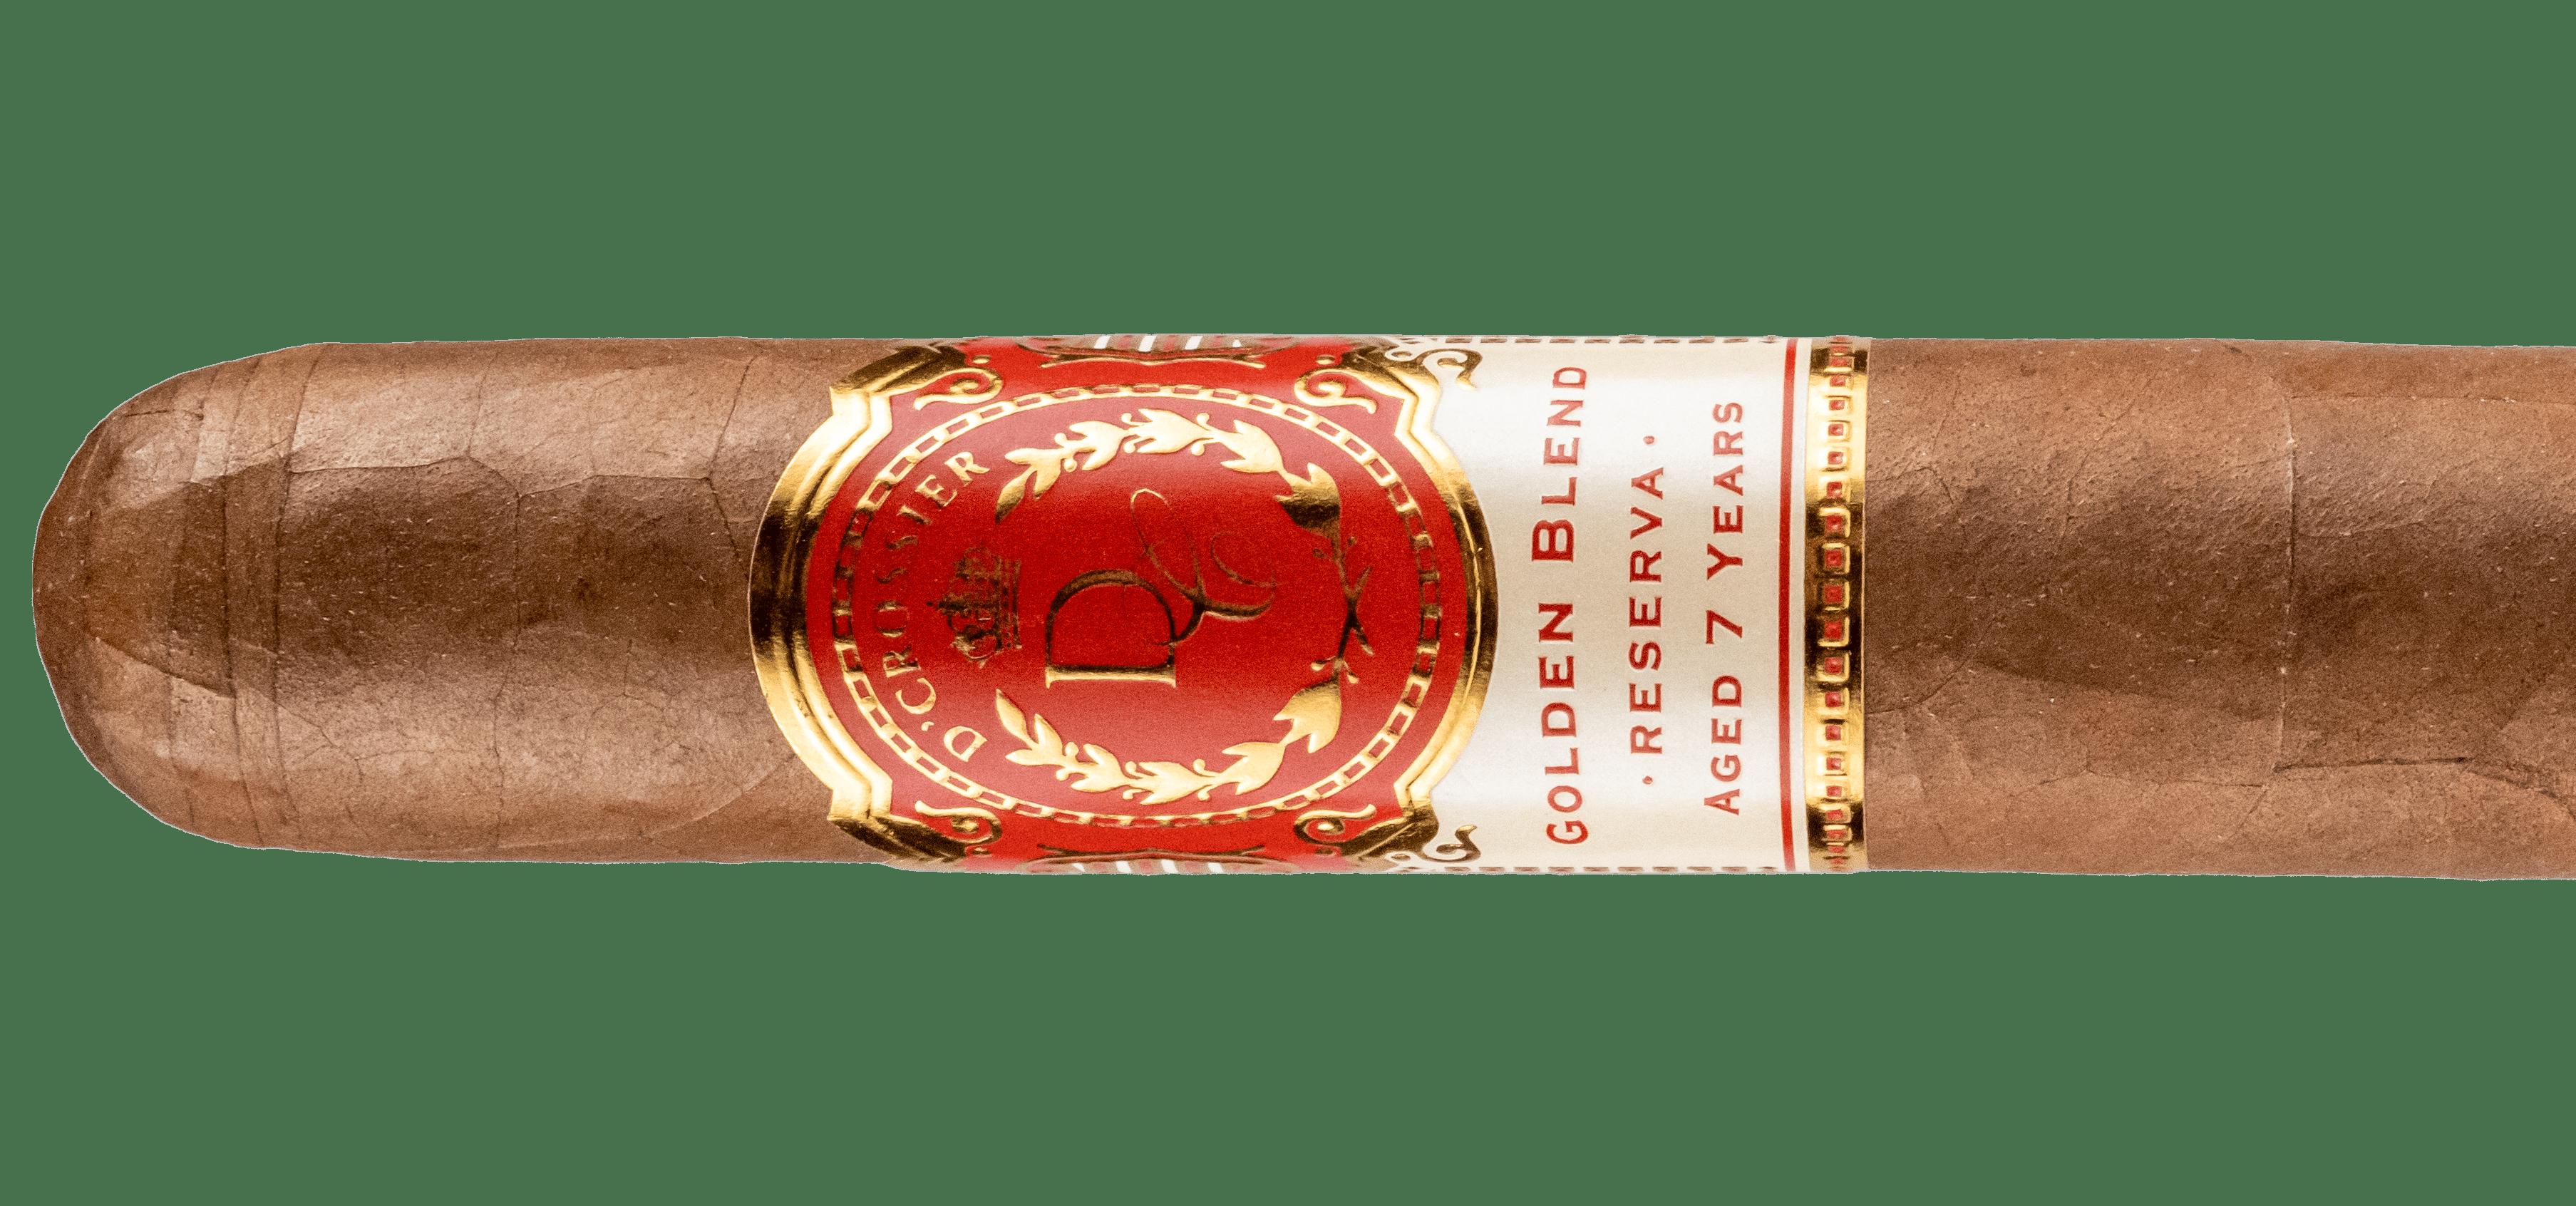 D'Crossier Golden Blend Reserva Cañonazo - Blind Cigar Review